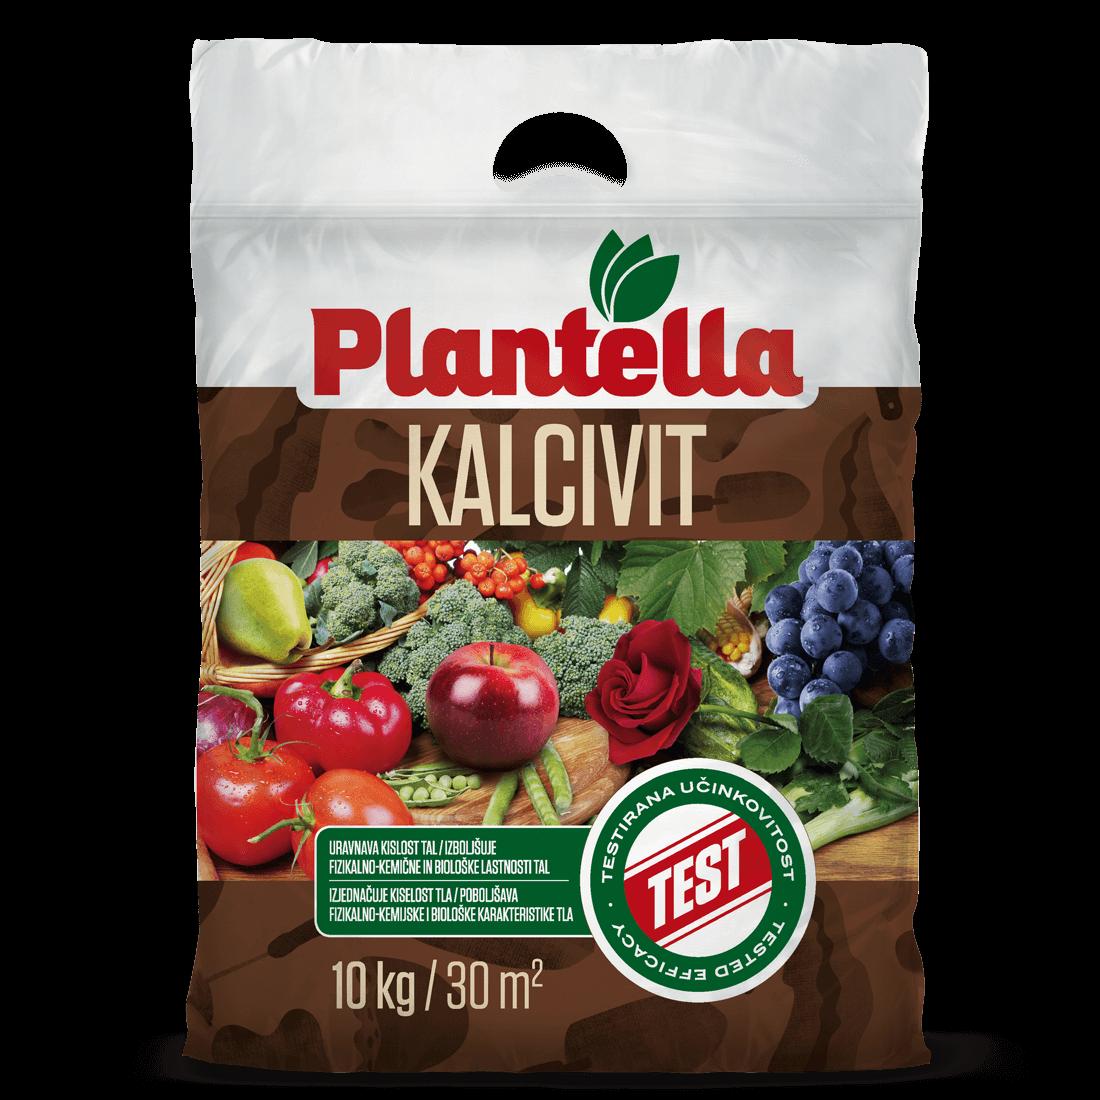 Plantella_Kalcivit_10kg_SI-HR